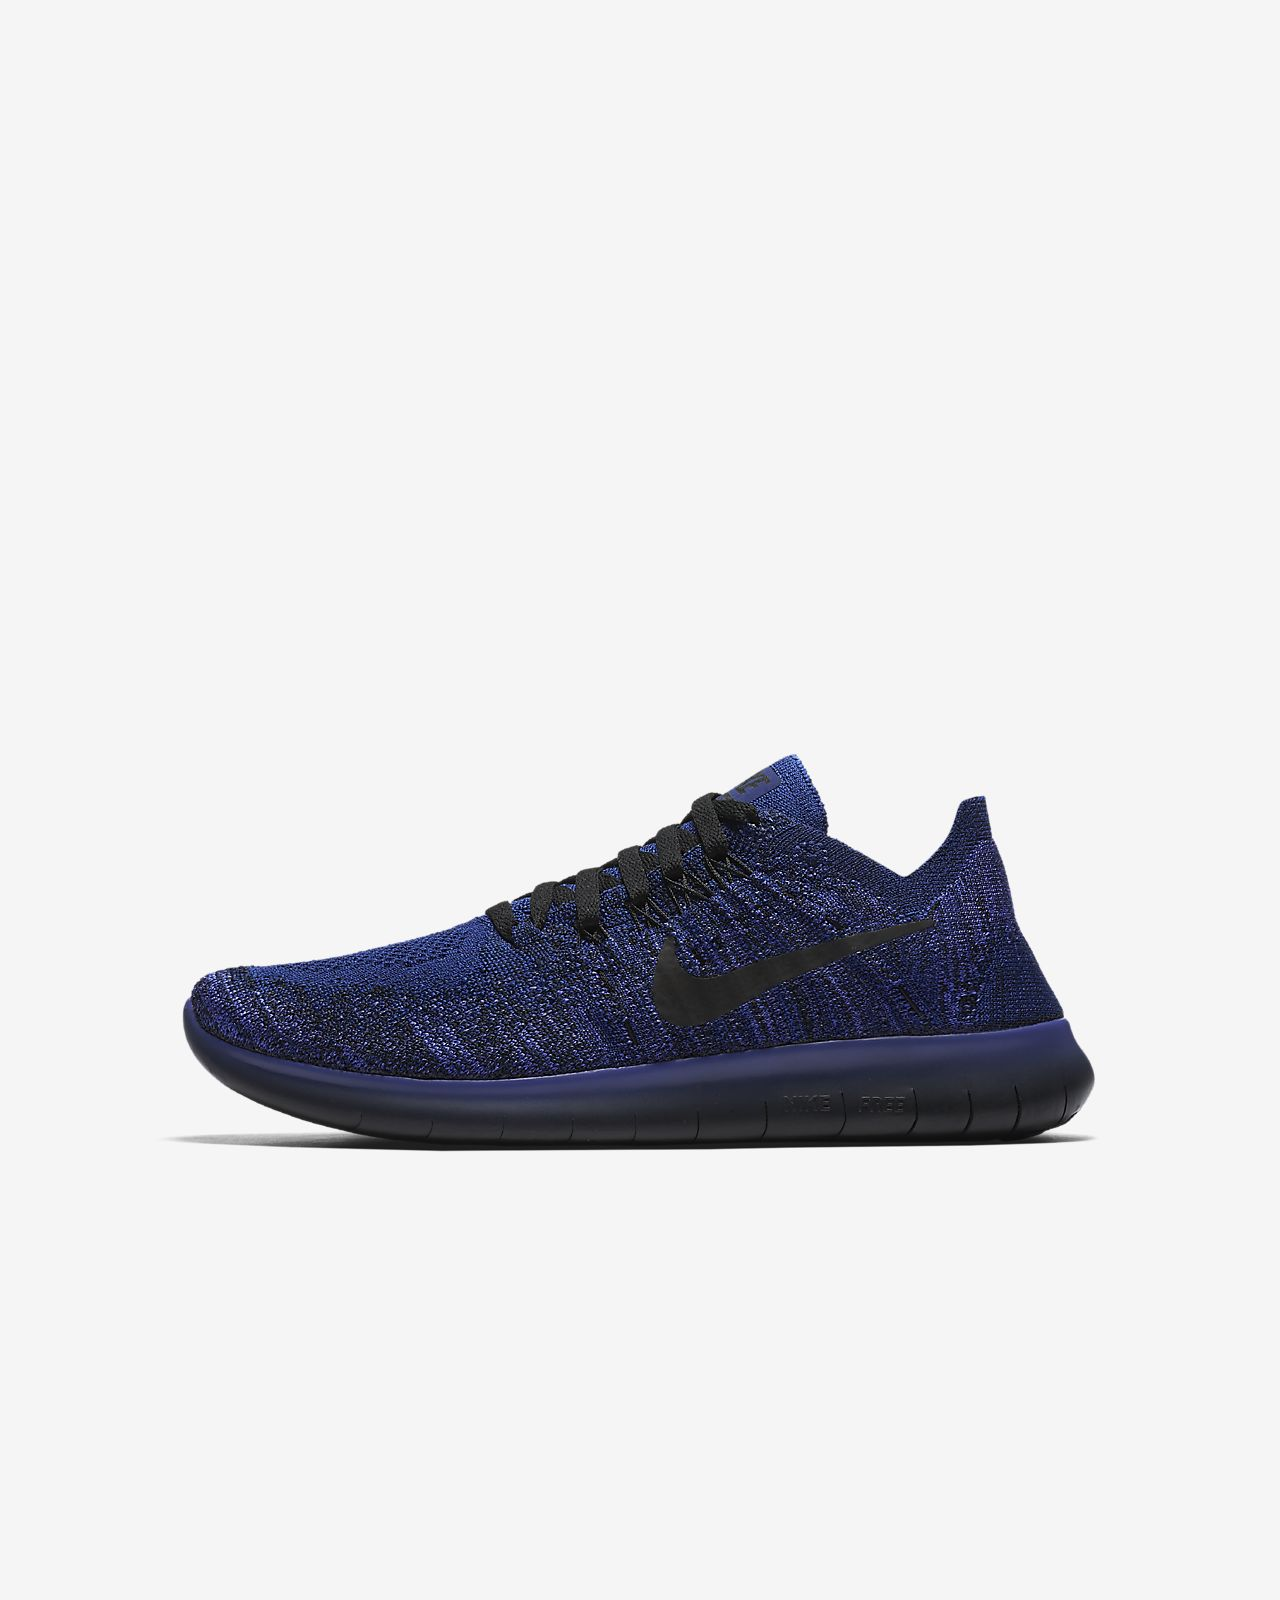 Nike Free Flyknit 2017 Rn Scarpe Da Ginnastica Running Corsa Palestra Casual